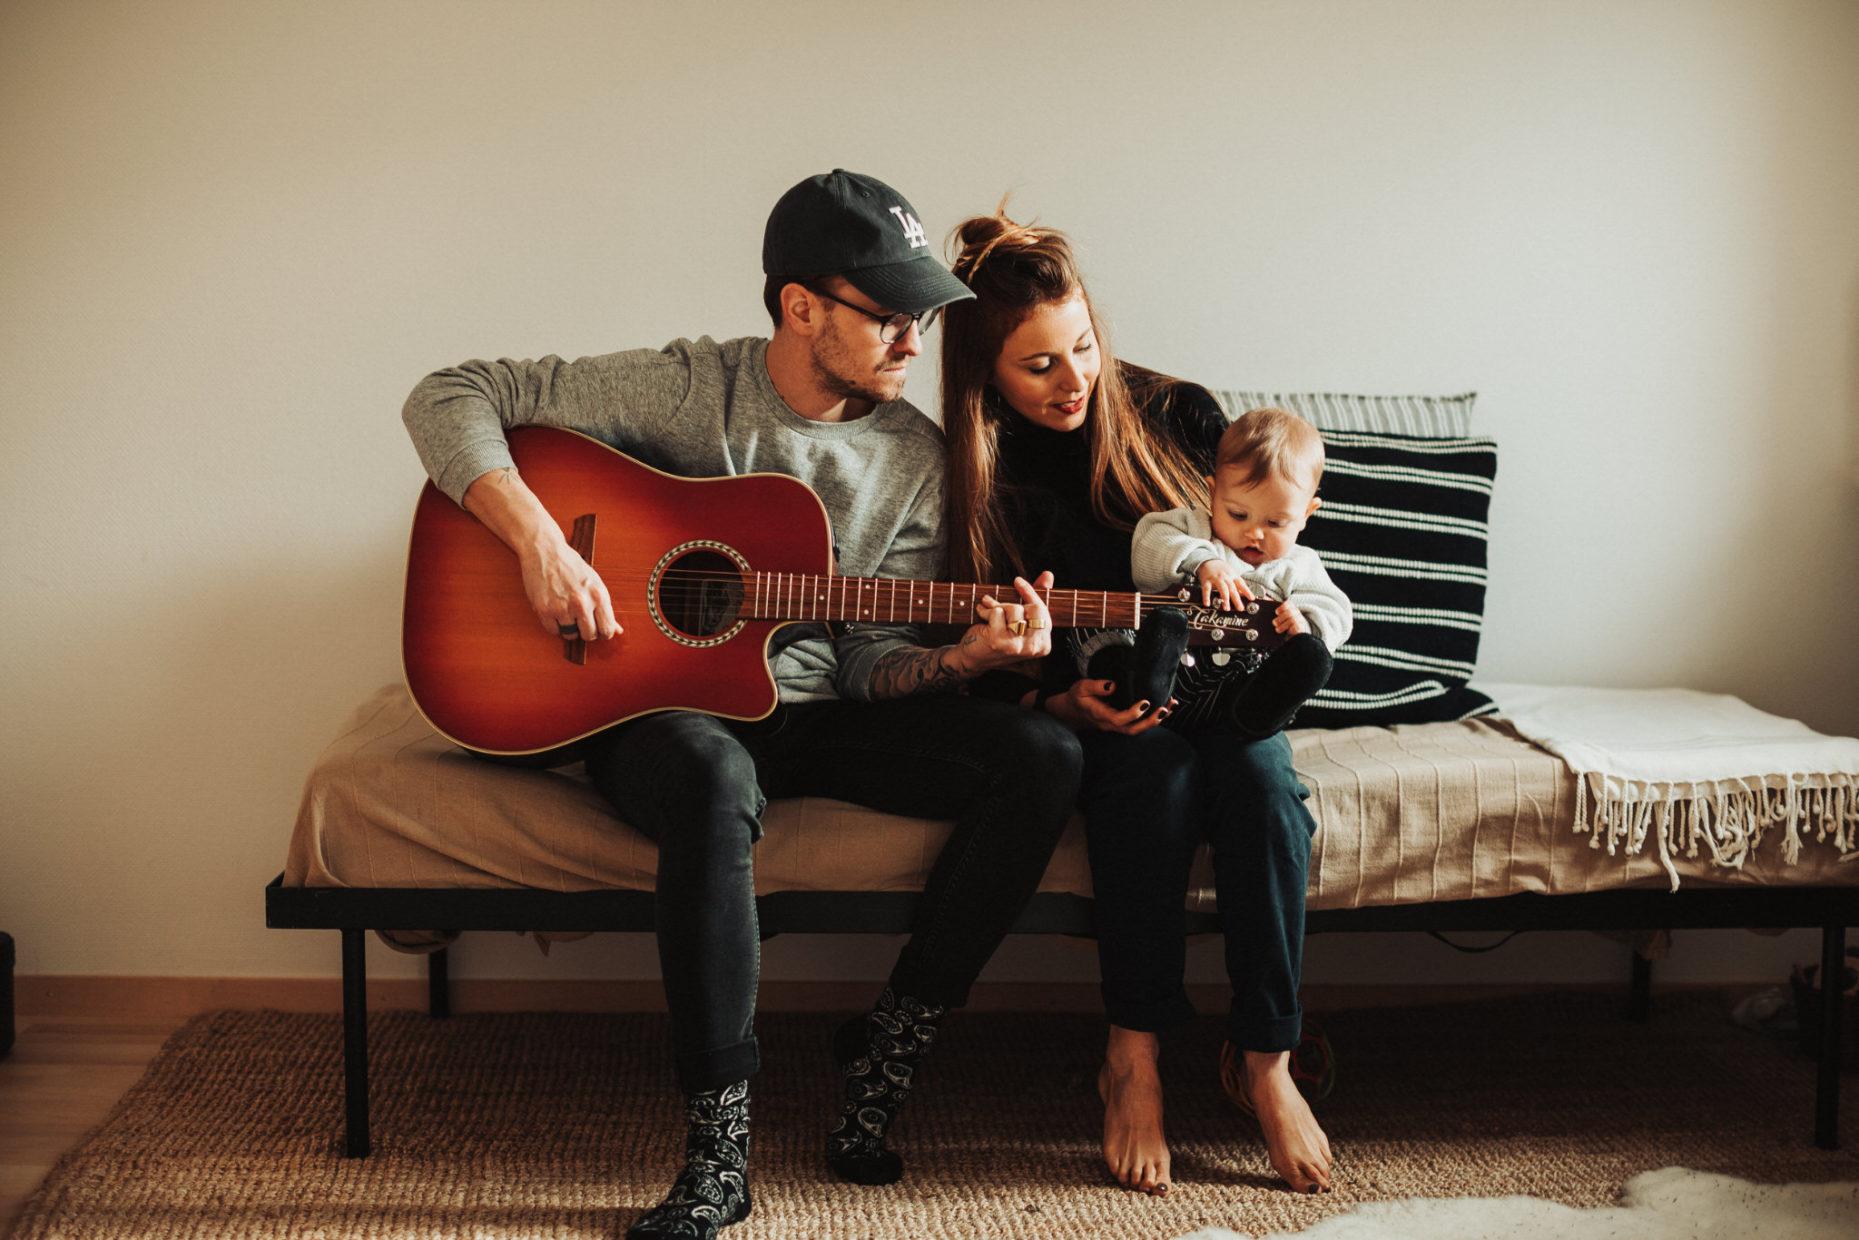 Familienfotos Chris Züger Fotografie